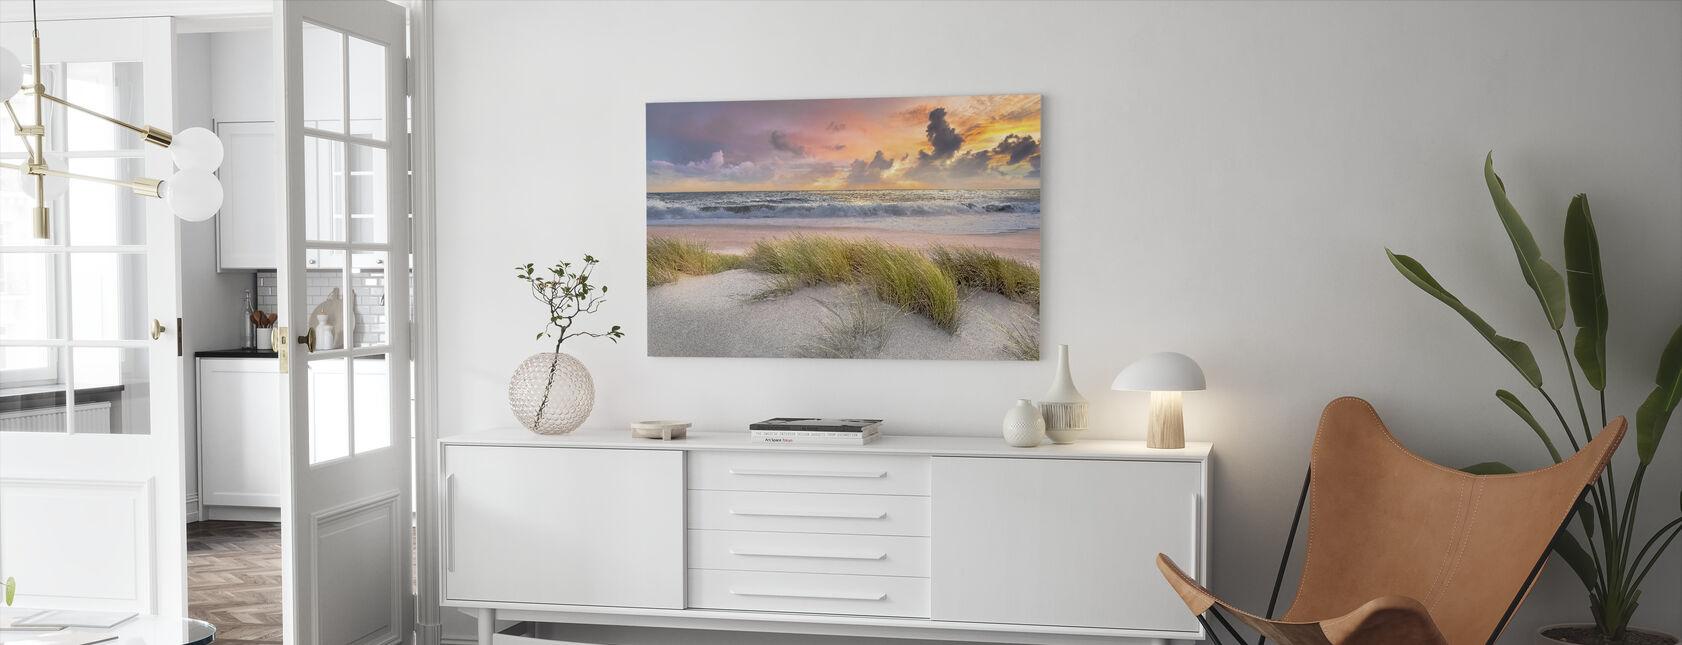 Gras in Strand Zand - Canvas print - Woonkamer